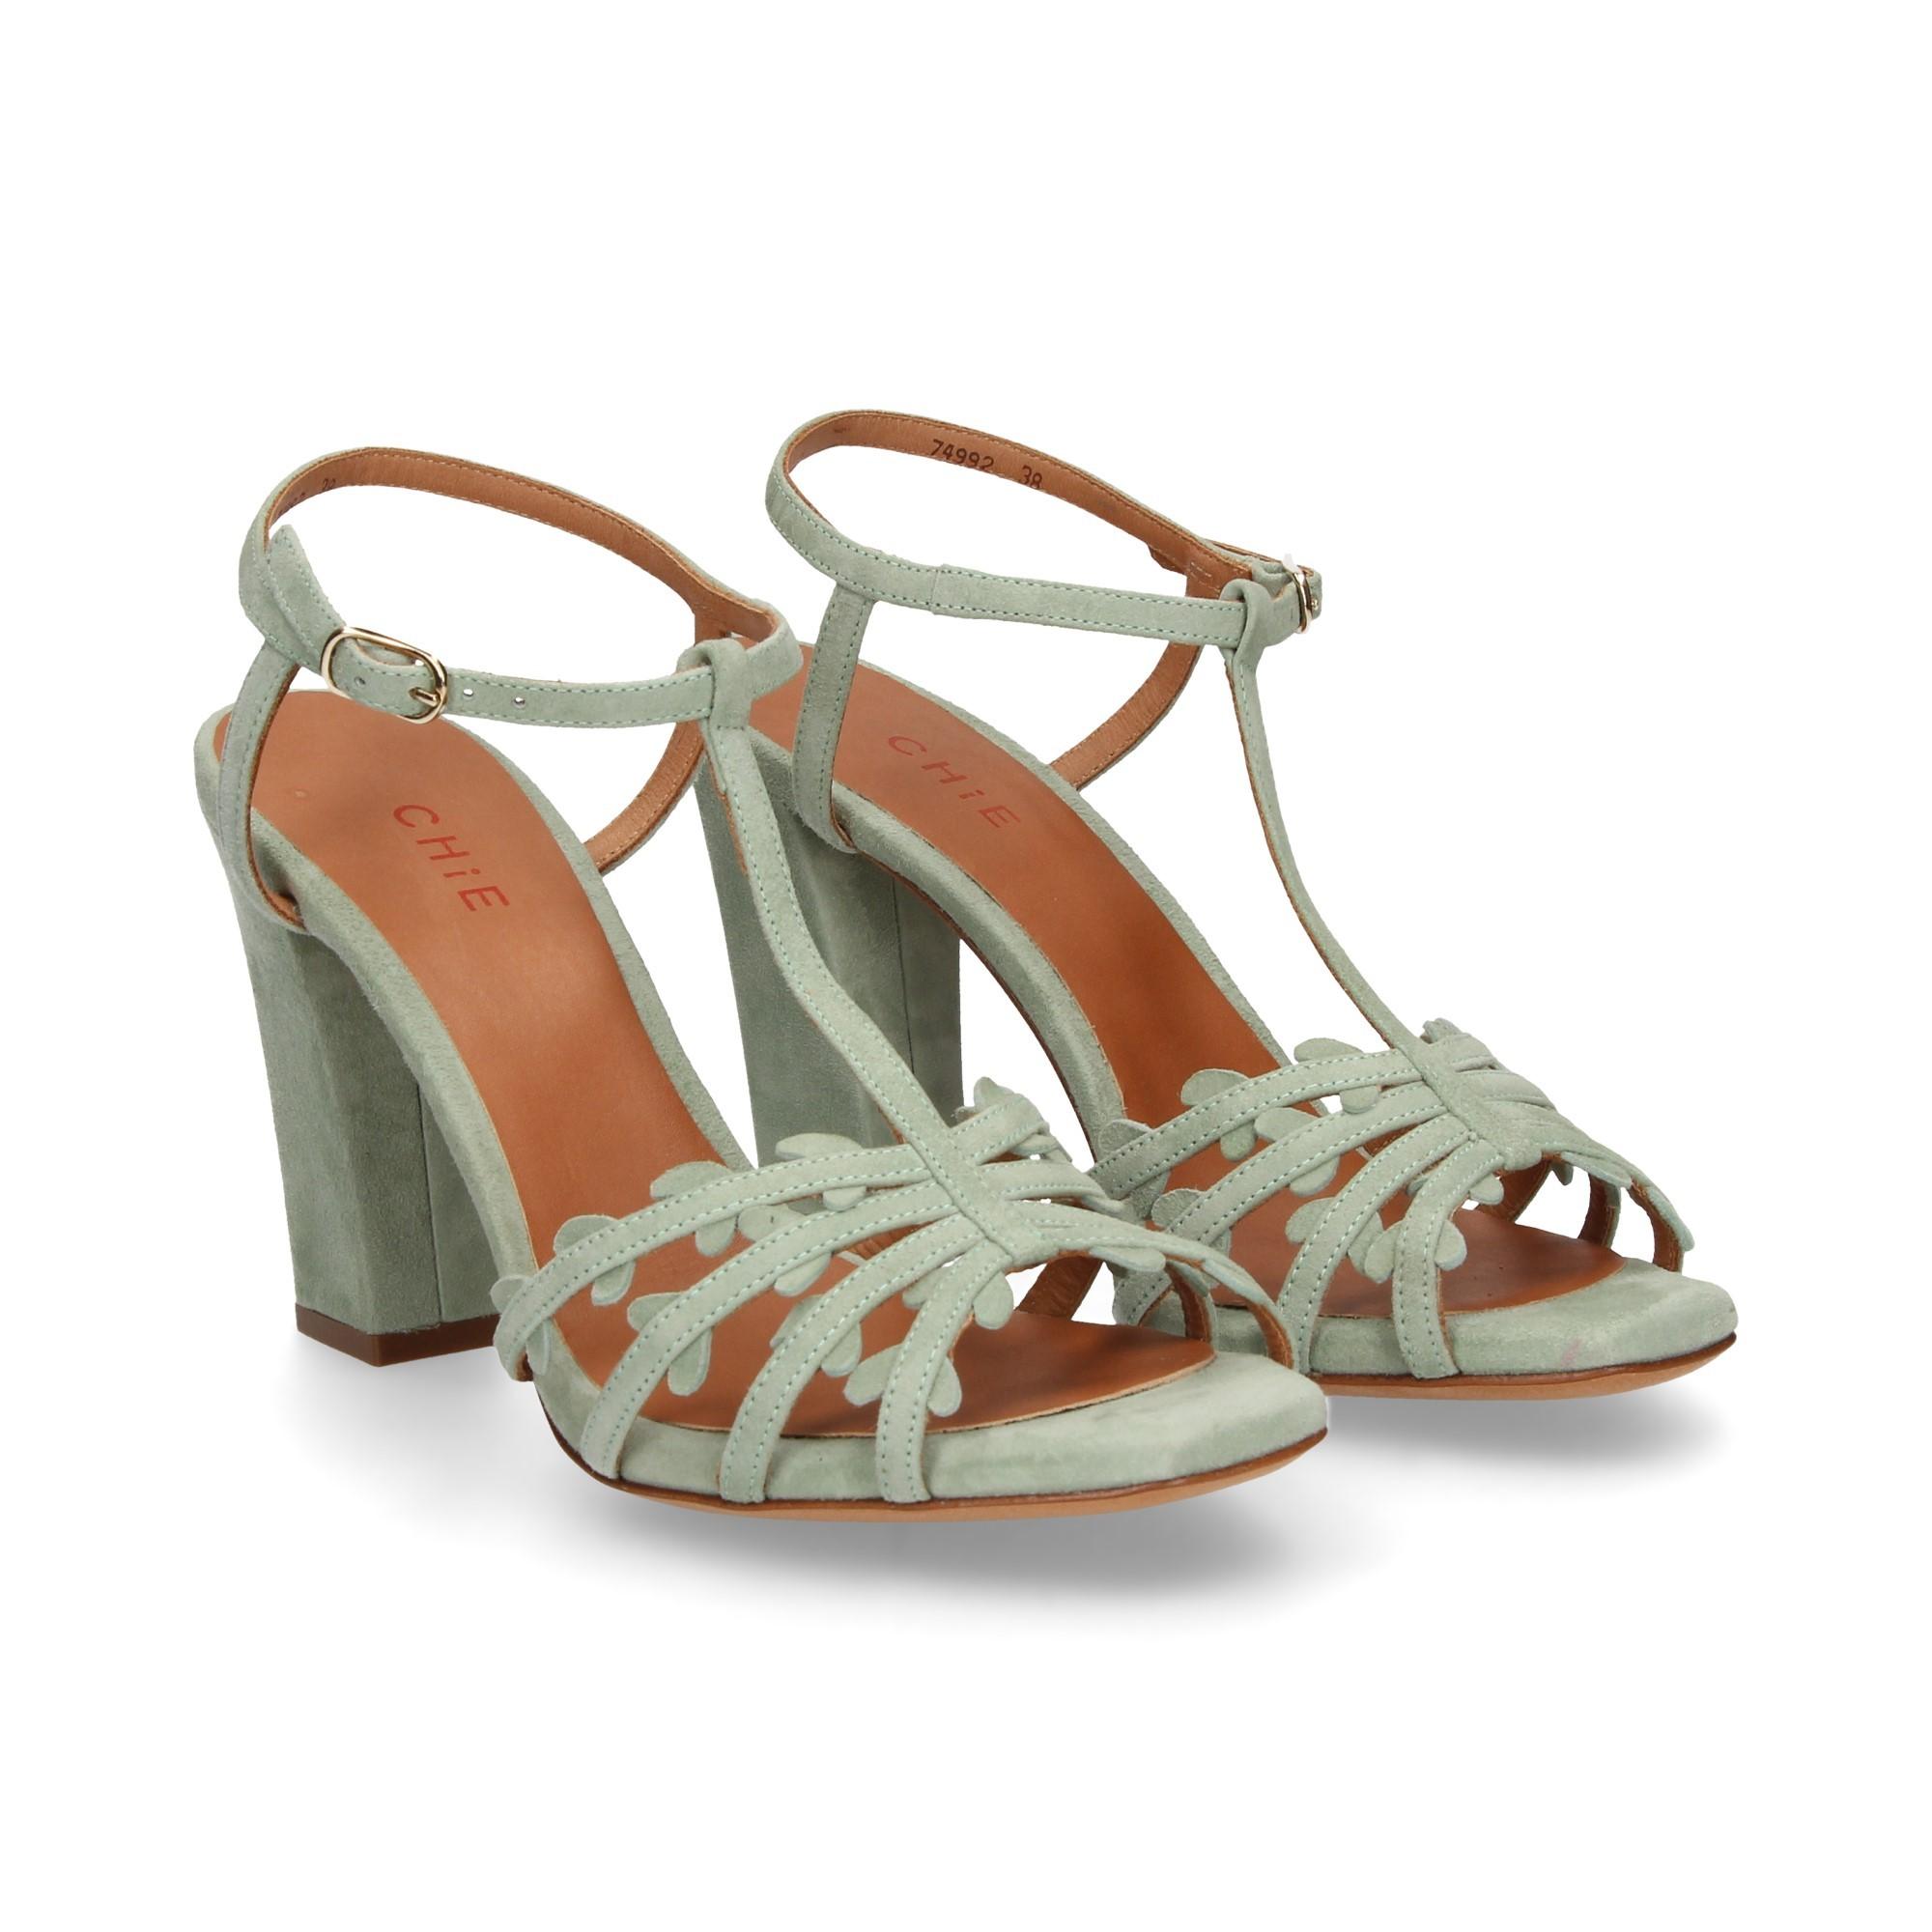 d509338f4 CHIE MIHARA Women's heeled sandals JANINA TURQUESA